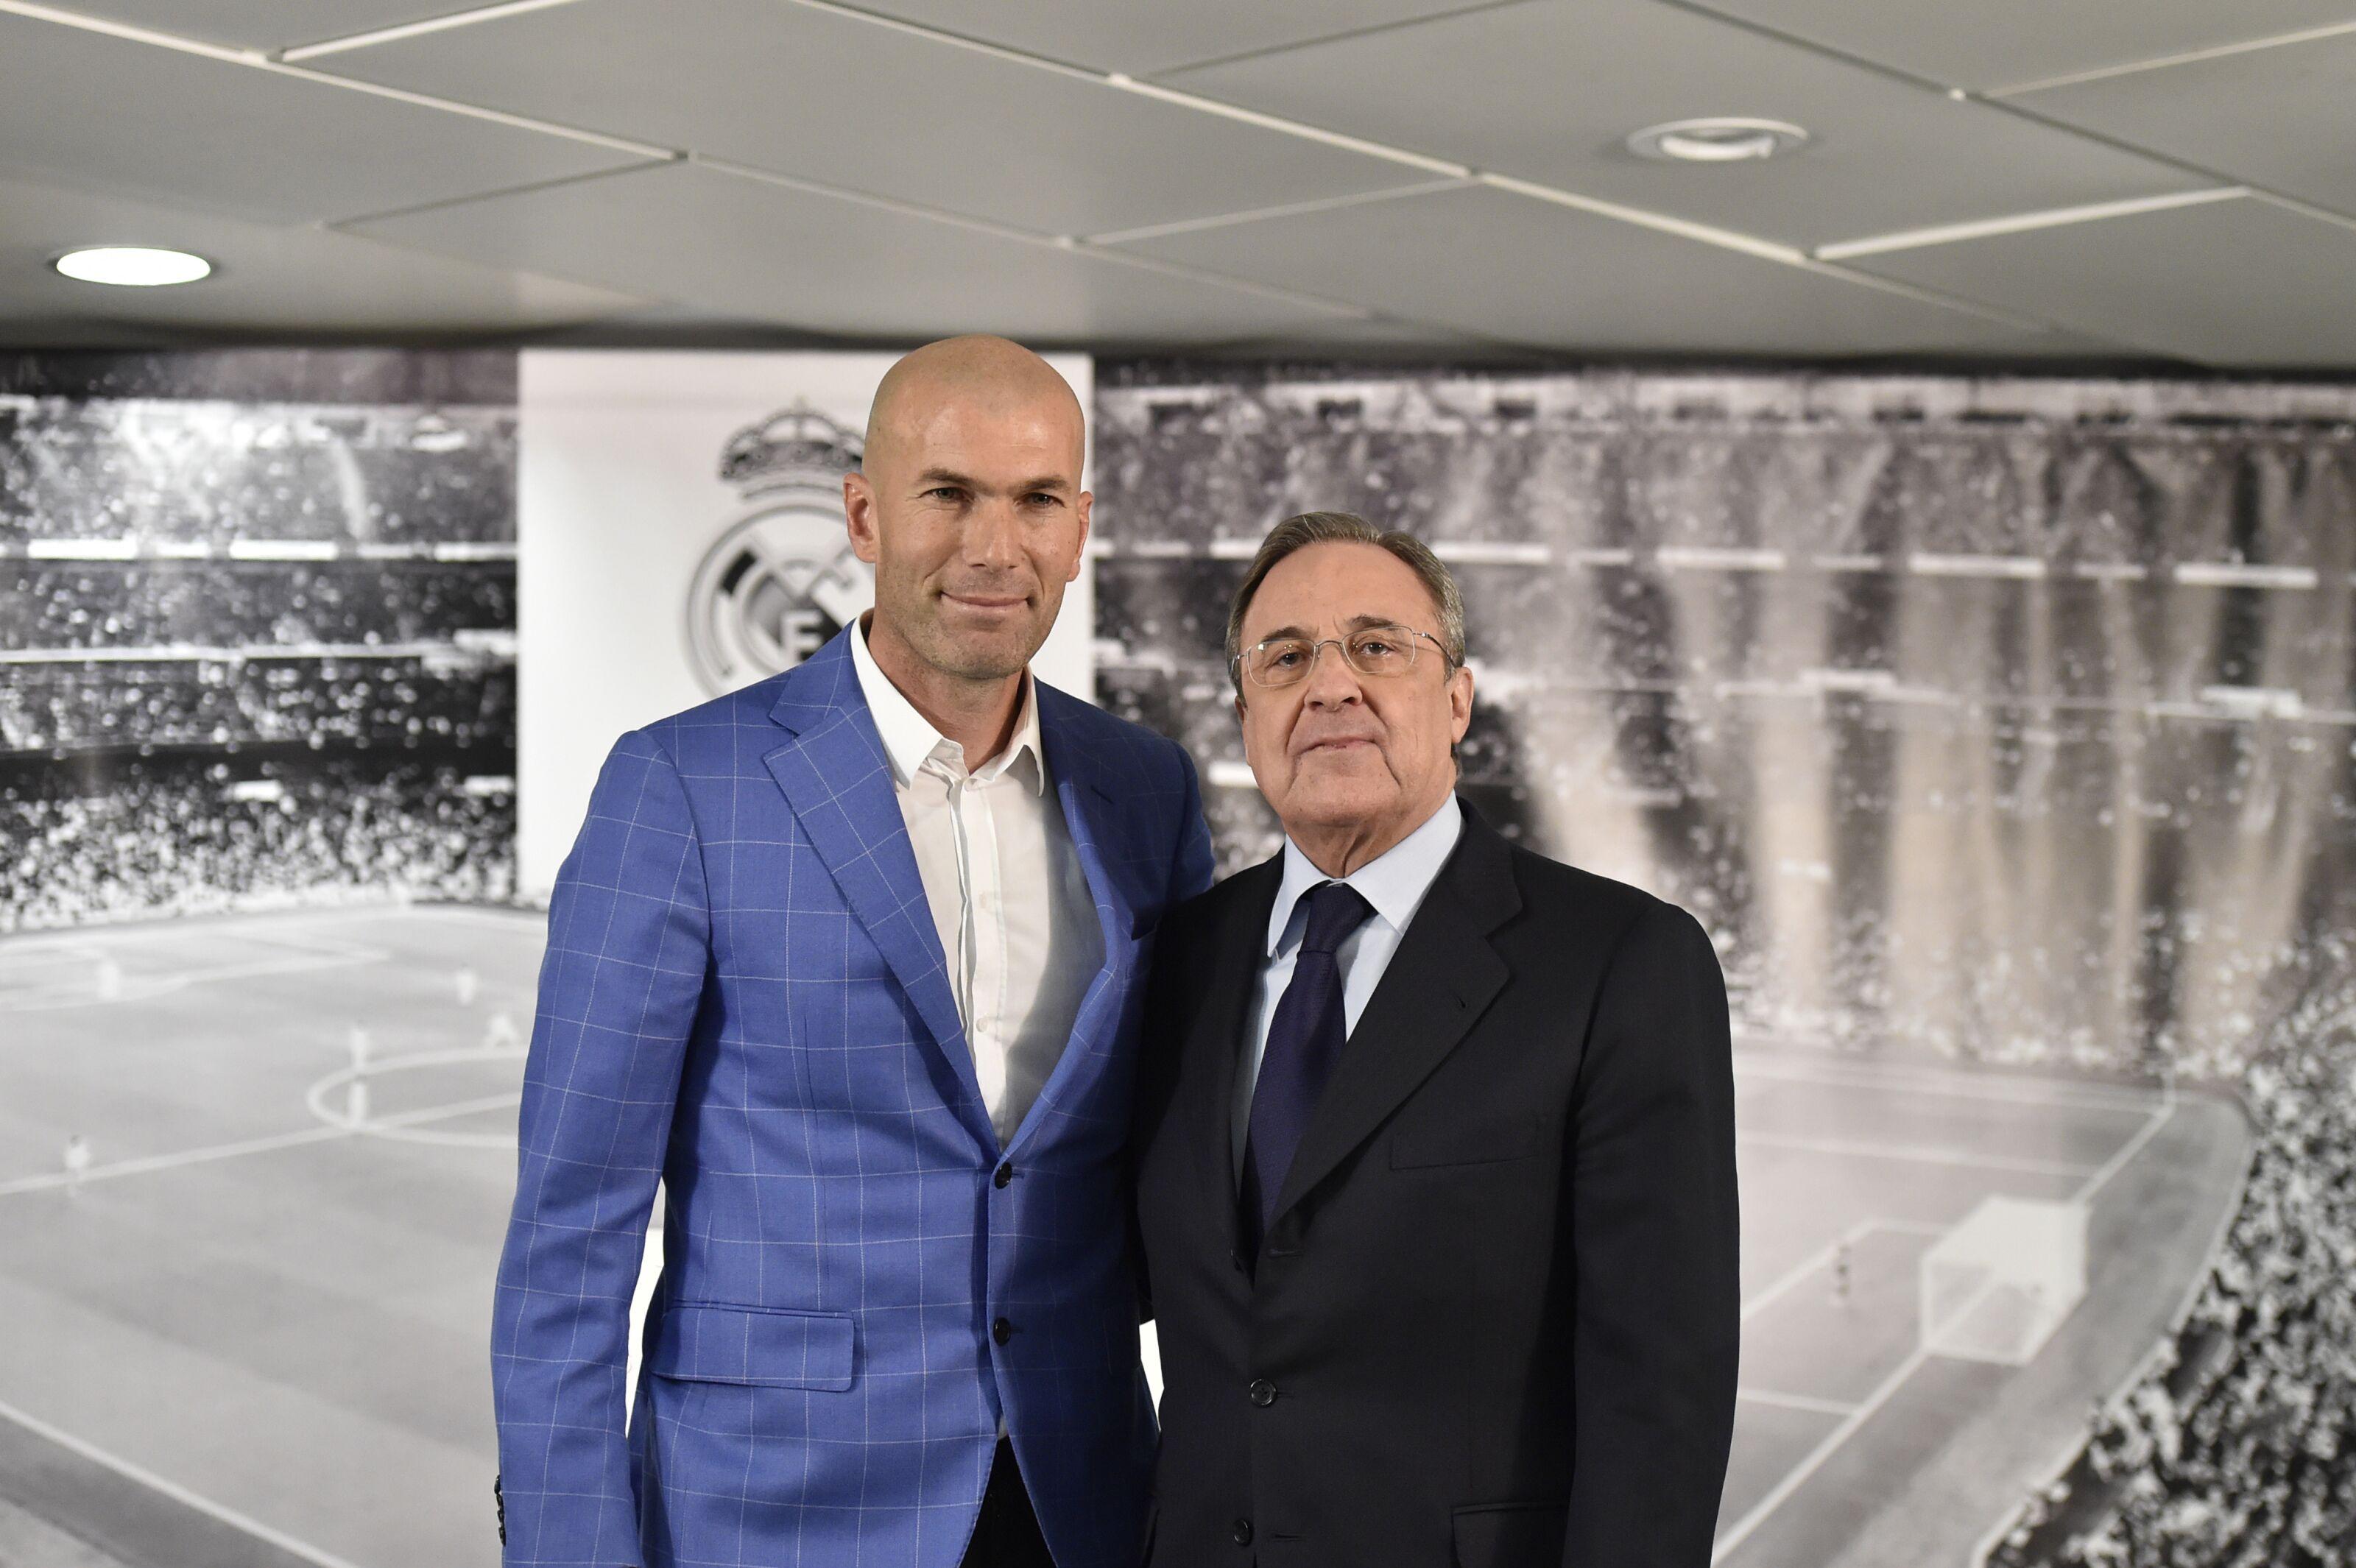 Real Madrid: Zinedine Zidane asks Florentino Perez to make three more signings